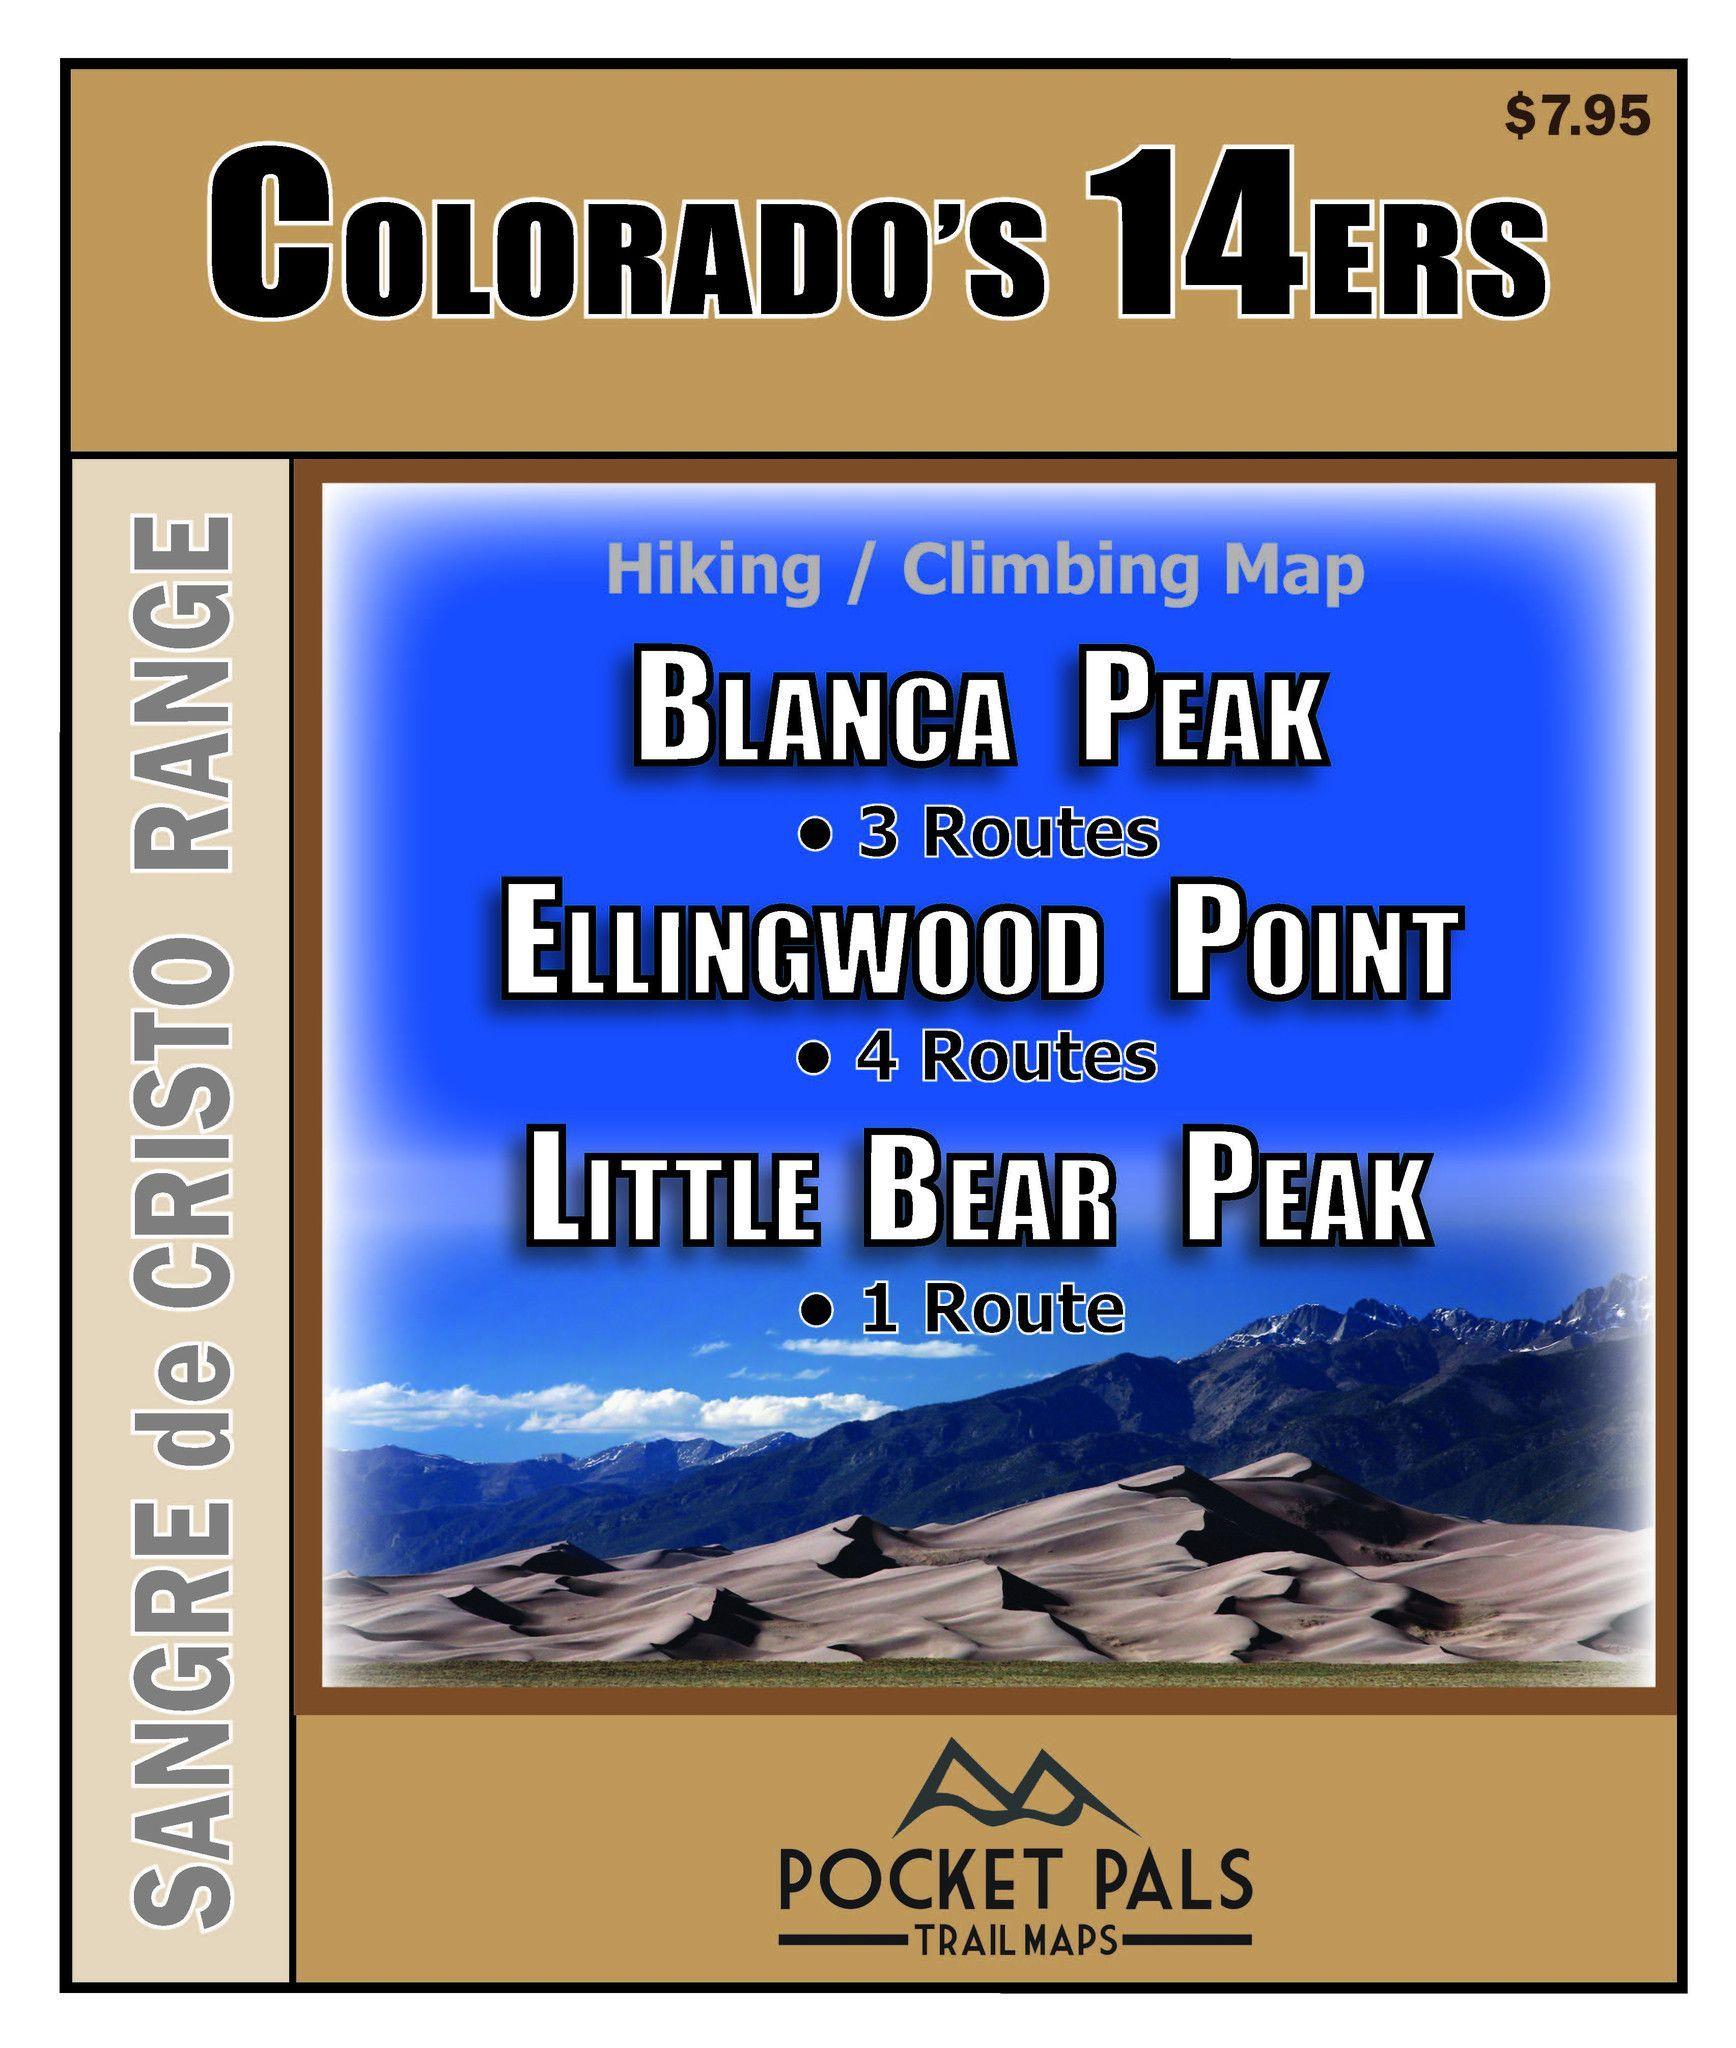 Blanca Peak, Ellingwood Point, Little Bear Peak - Sangre de Cristo Range